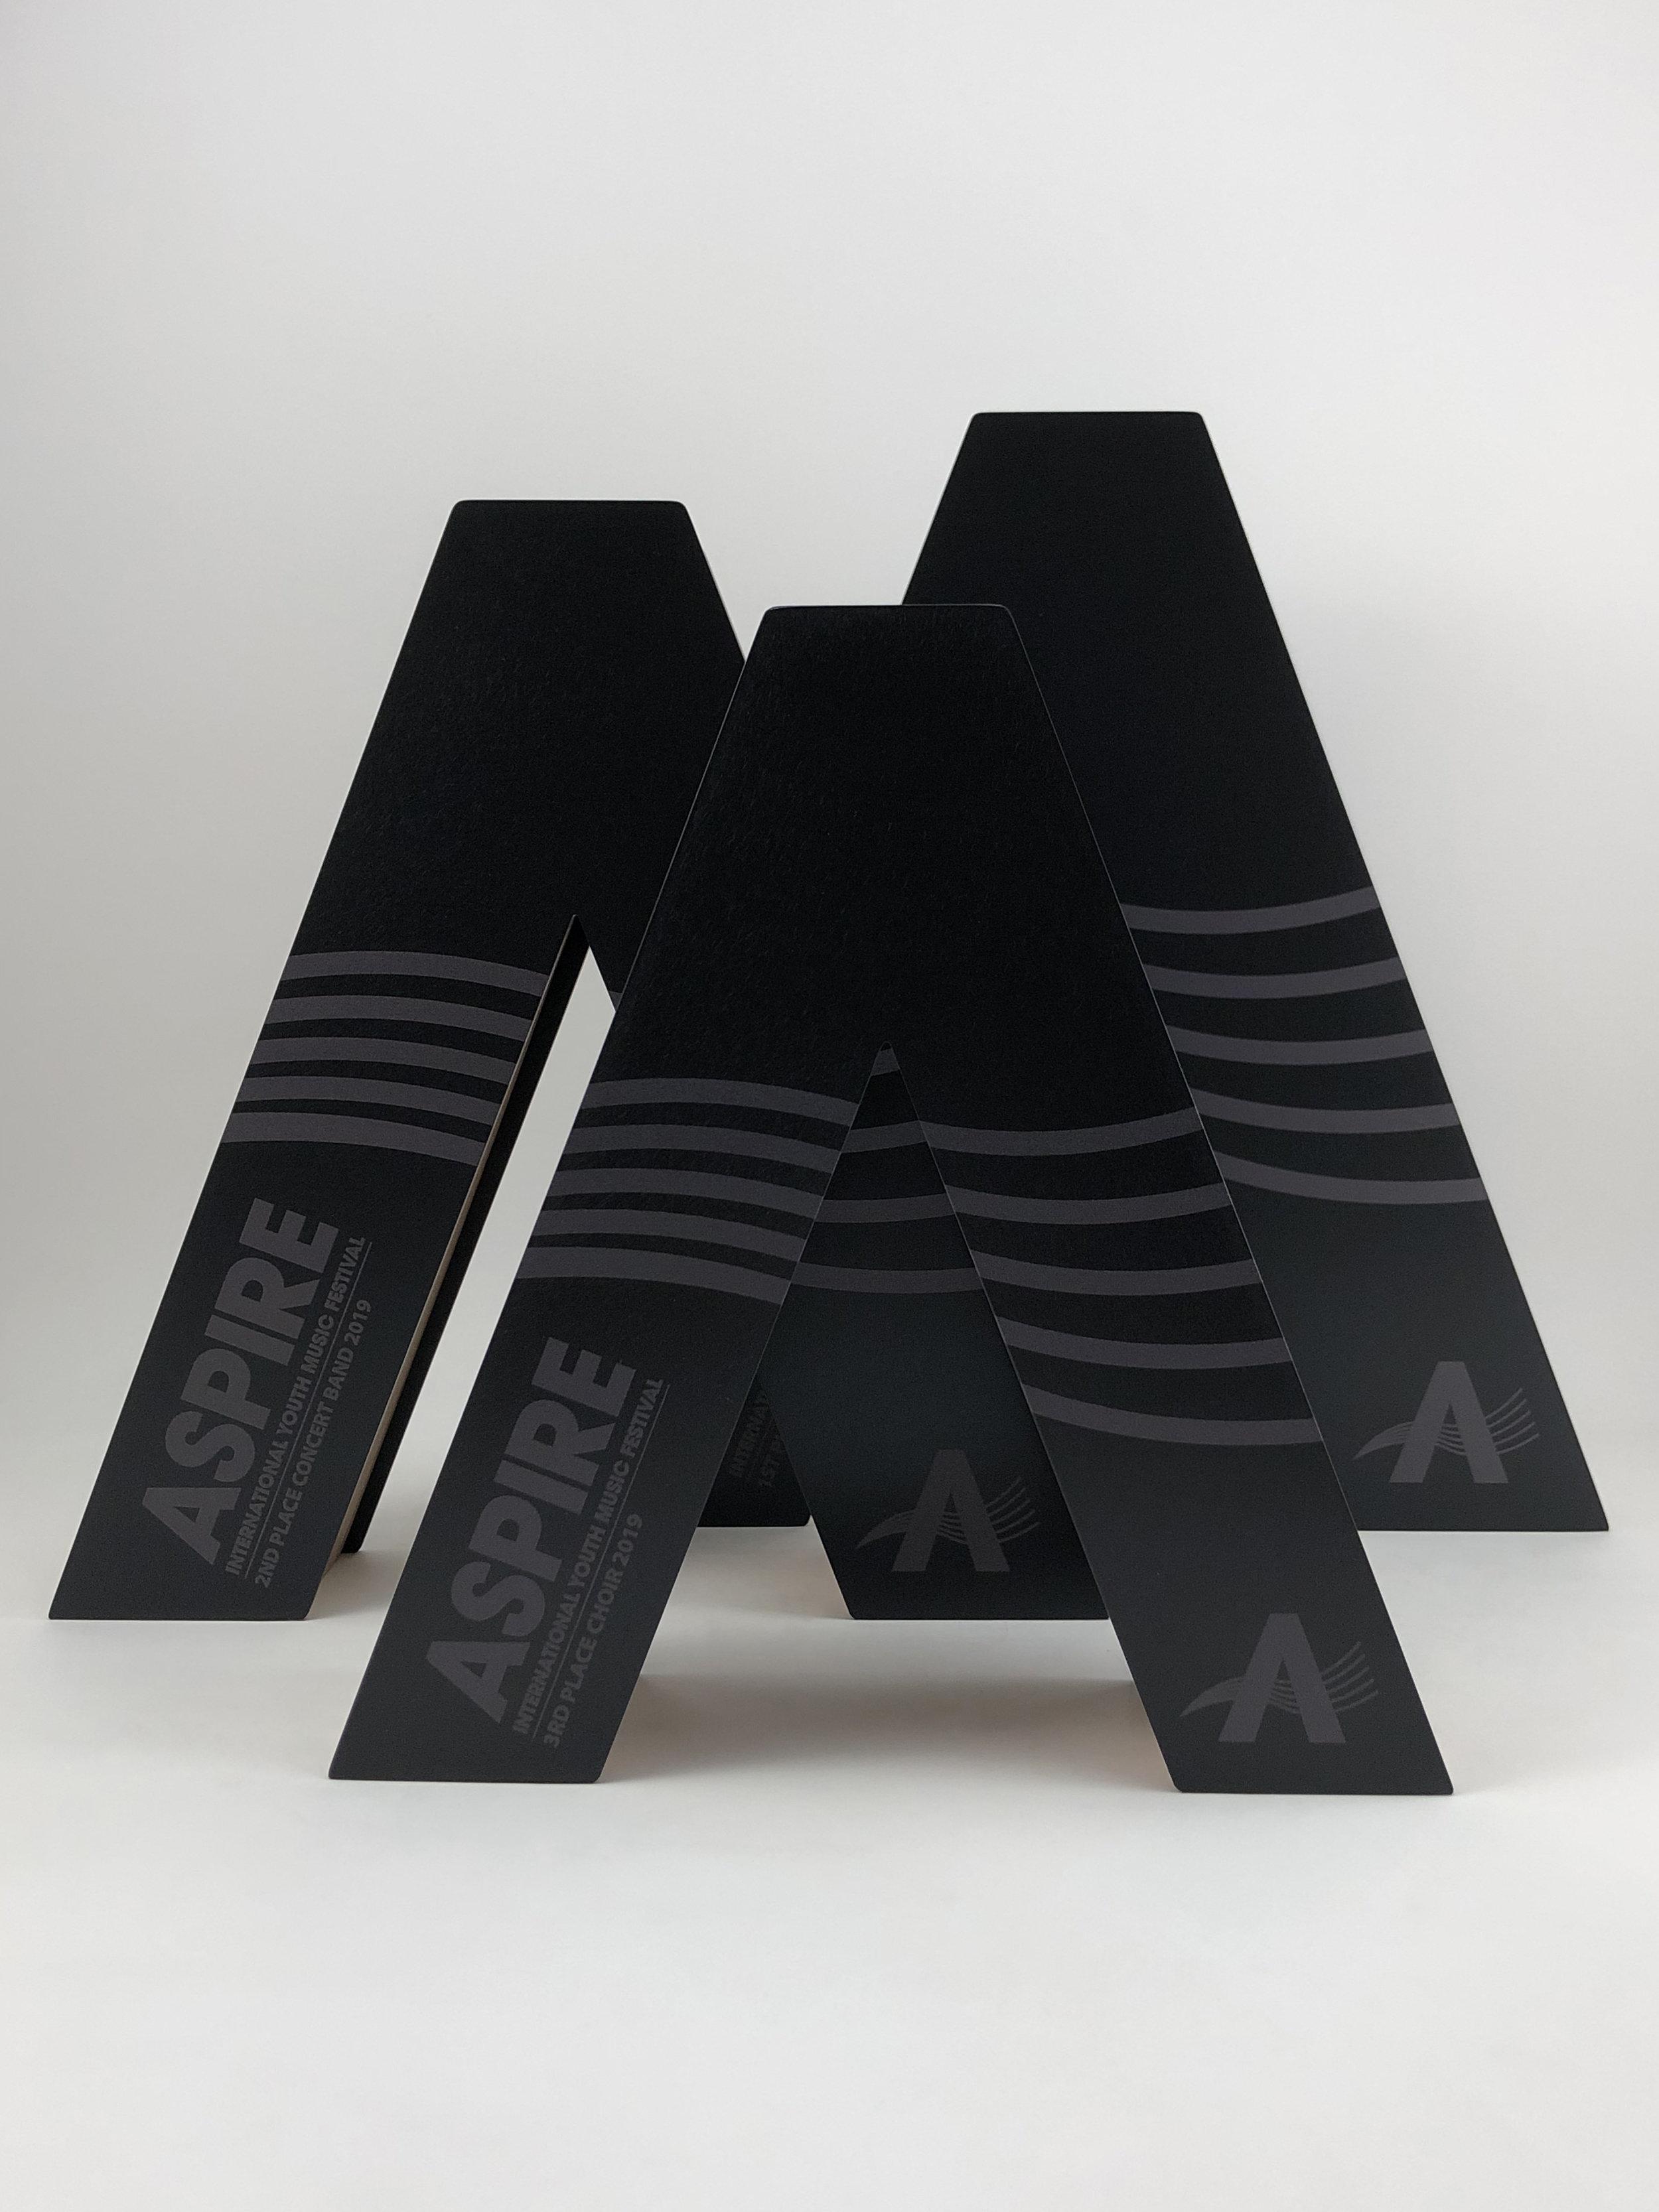 aspire-international-youth-music-festival-timber-metal-eco-trophy-awards-03.jpg